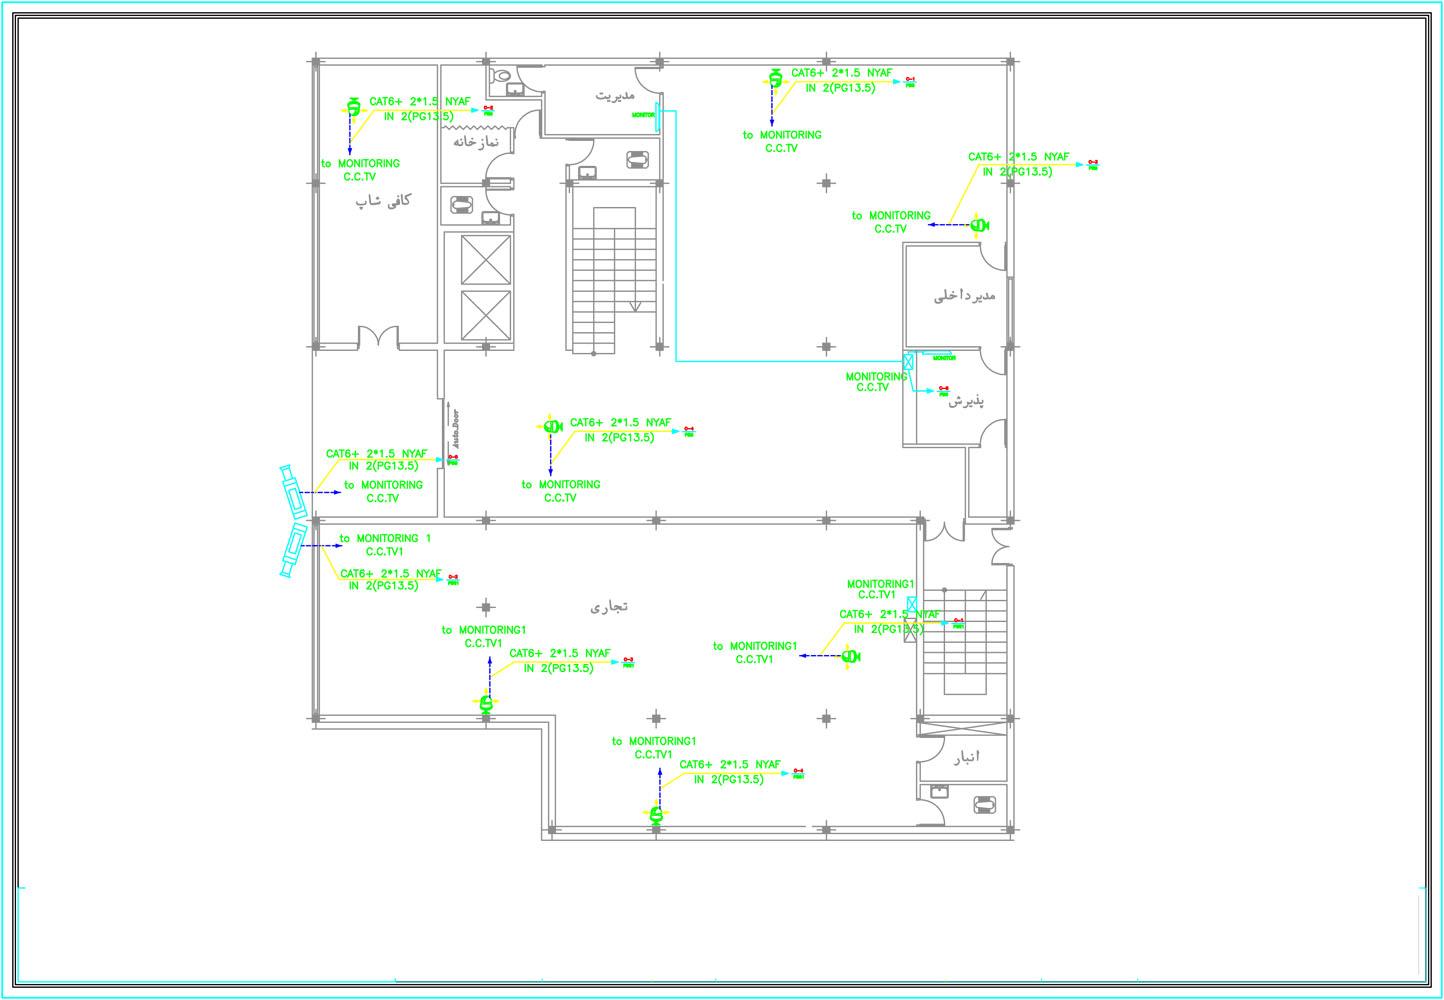 نقشه-سیم-کشی-دوربین-مداربسته-ساختمان,نقشه دوربین مداربسته,نقشه سیم کشی دوربین مداربسته,نرم افزار نقشه کشی دوربین مداربسته,نقشه دوربین مداربسته در ساختمان